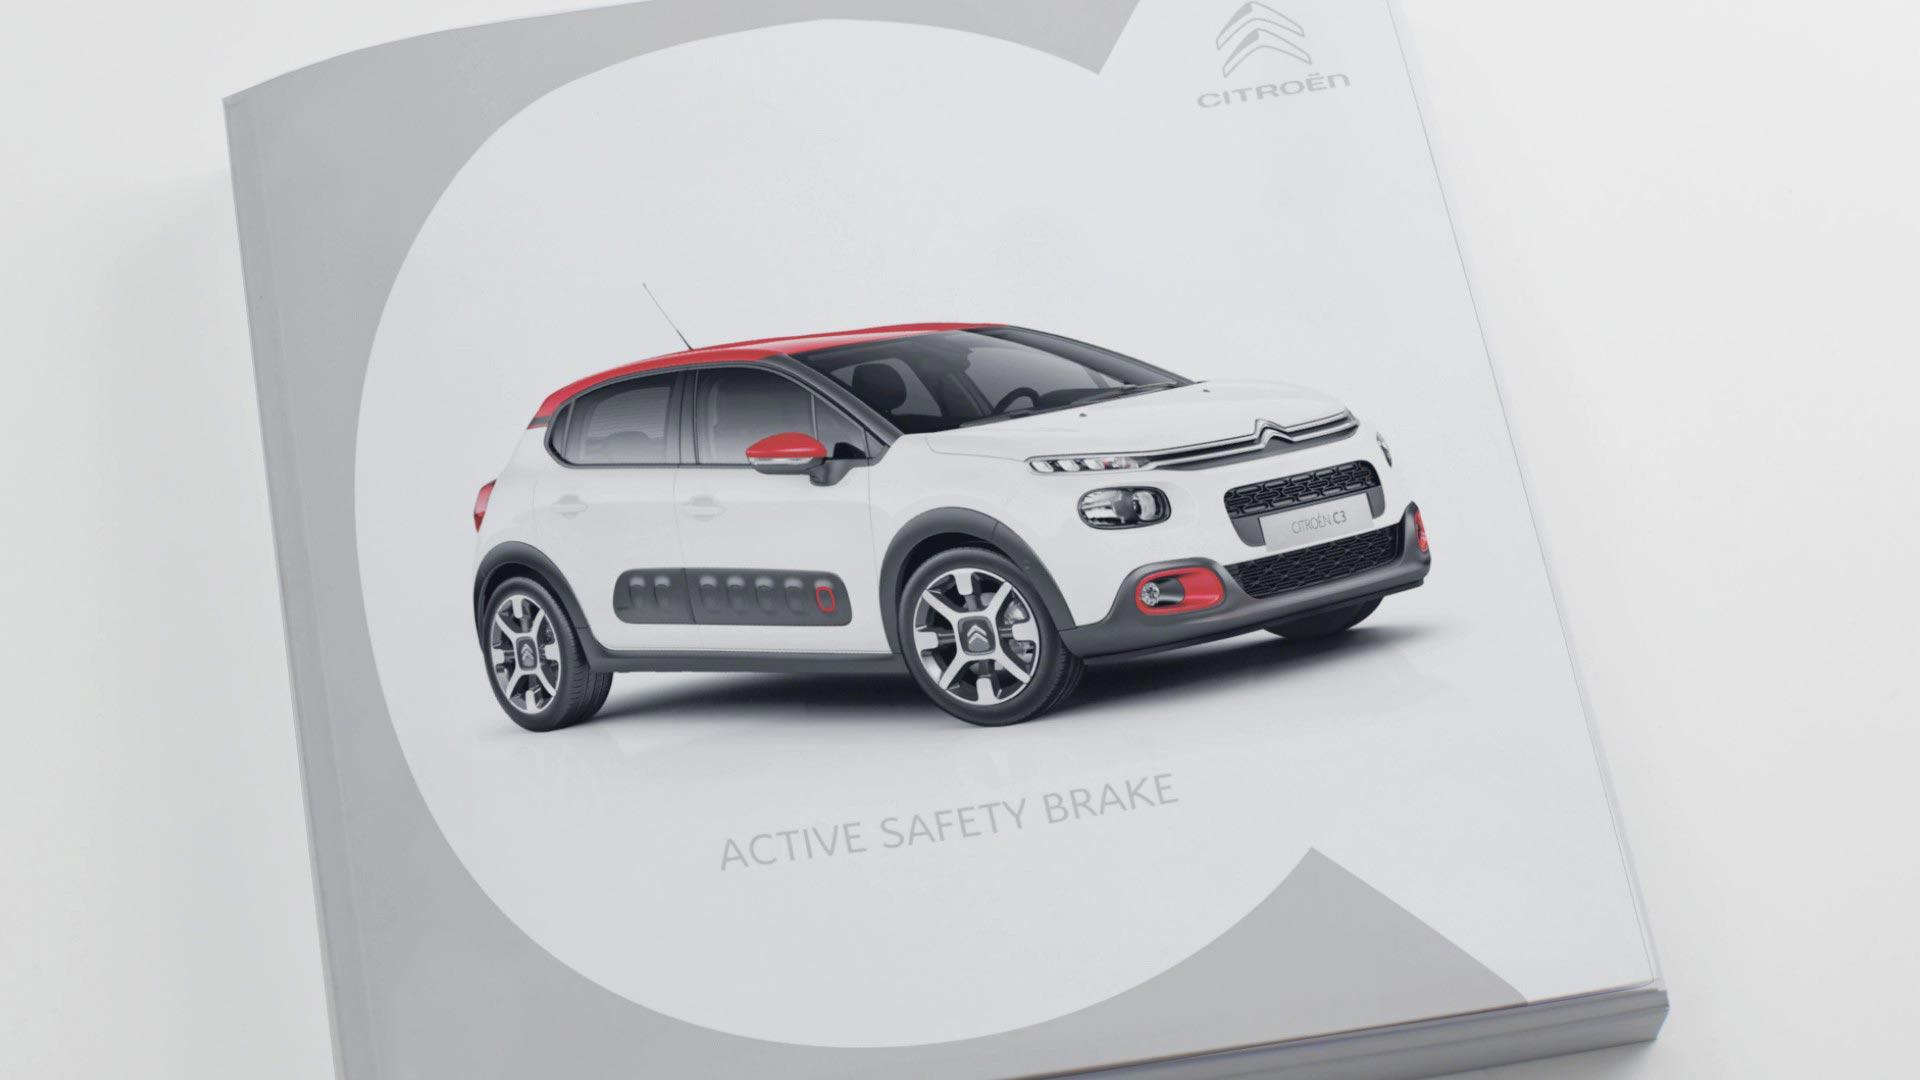 Citroen C3 Tutorial Video - Active Safety Brake